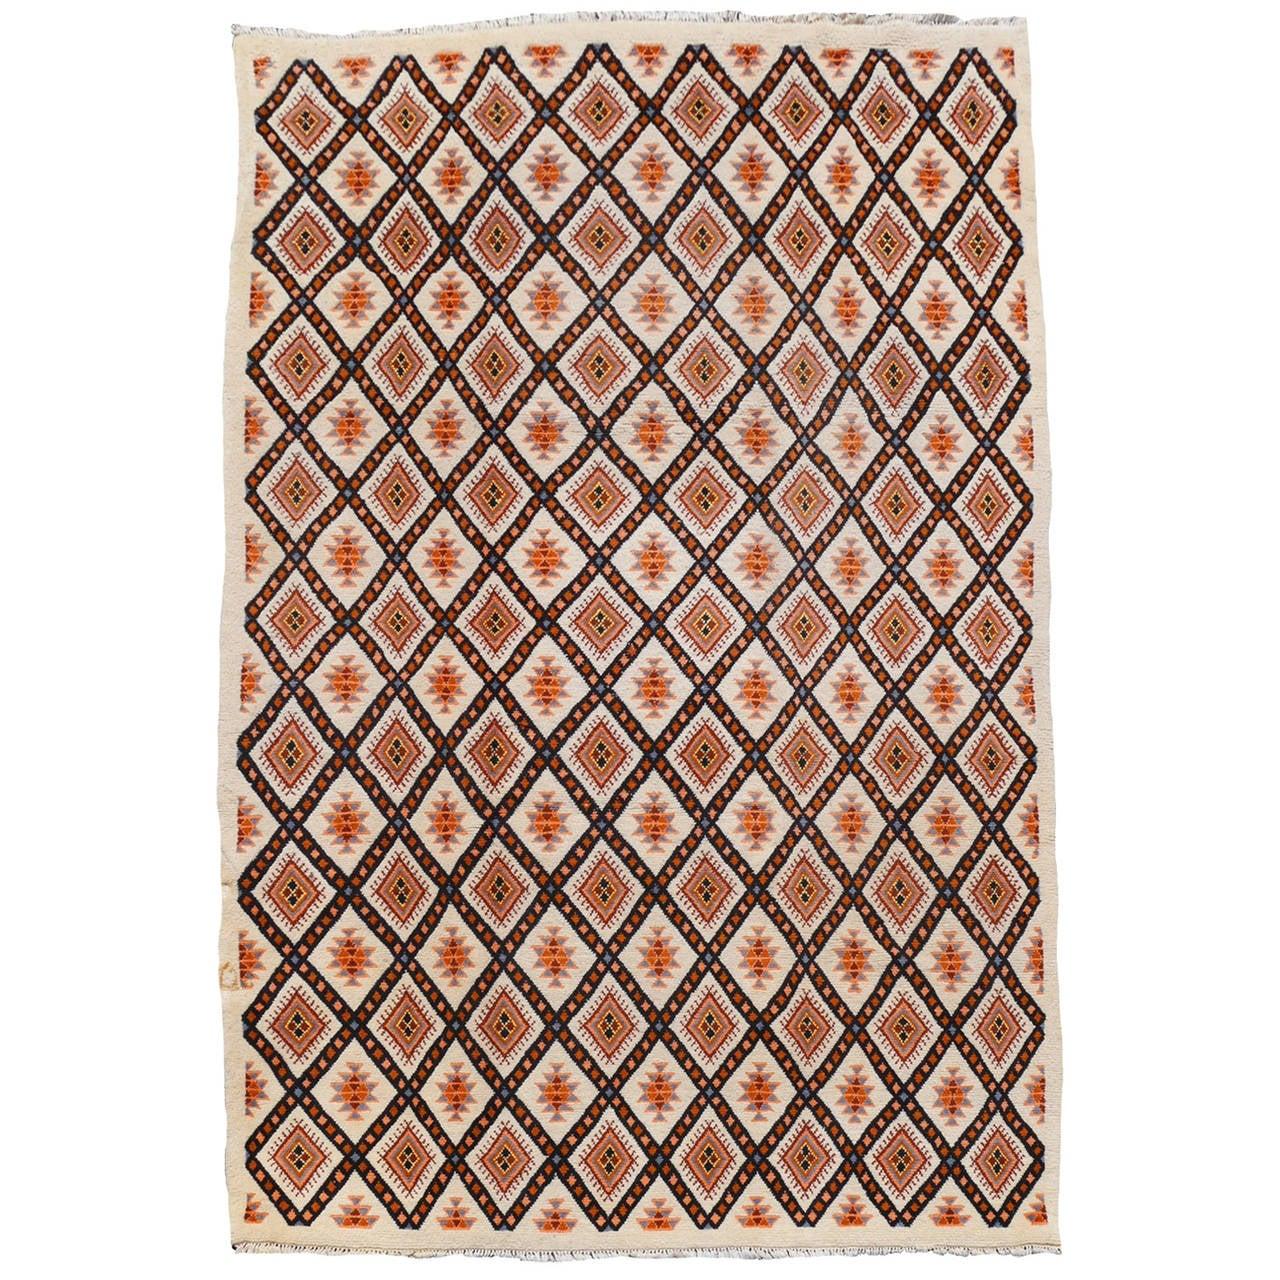 Amazing North African Tribal Berber Rug With Diamond Design 1